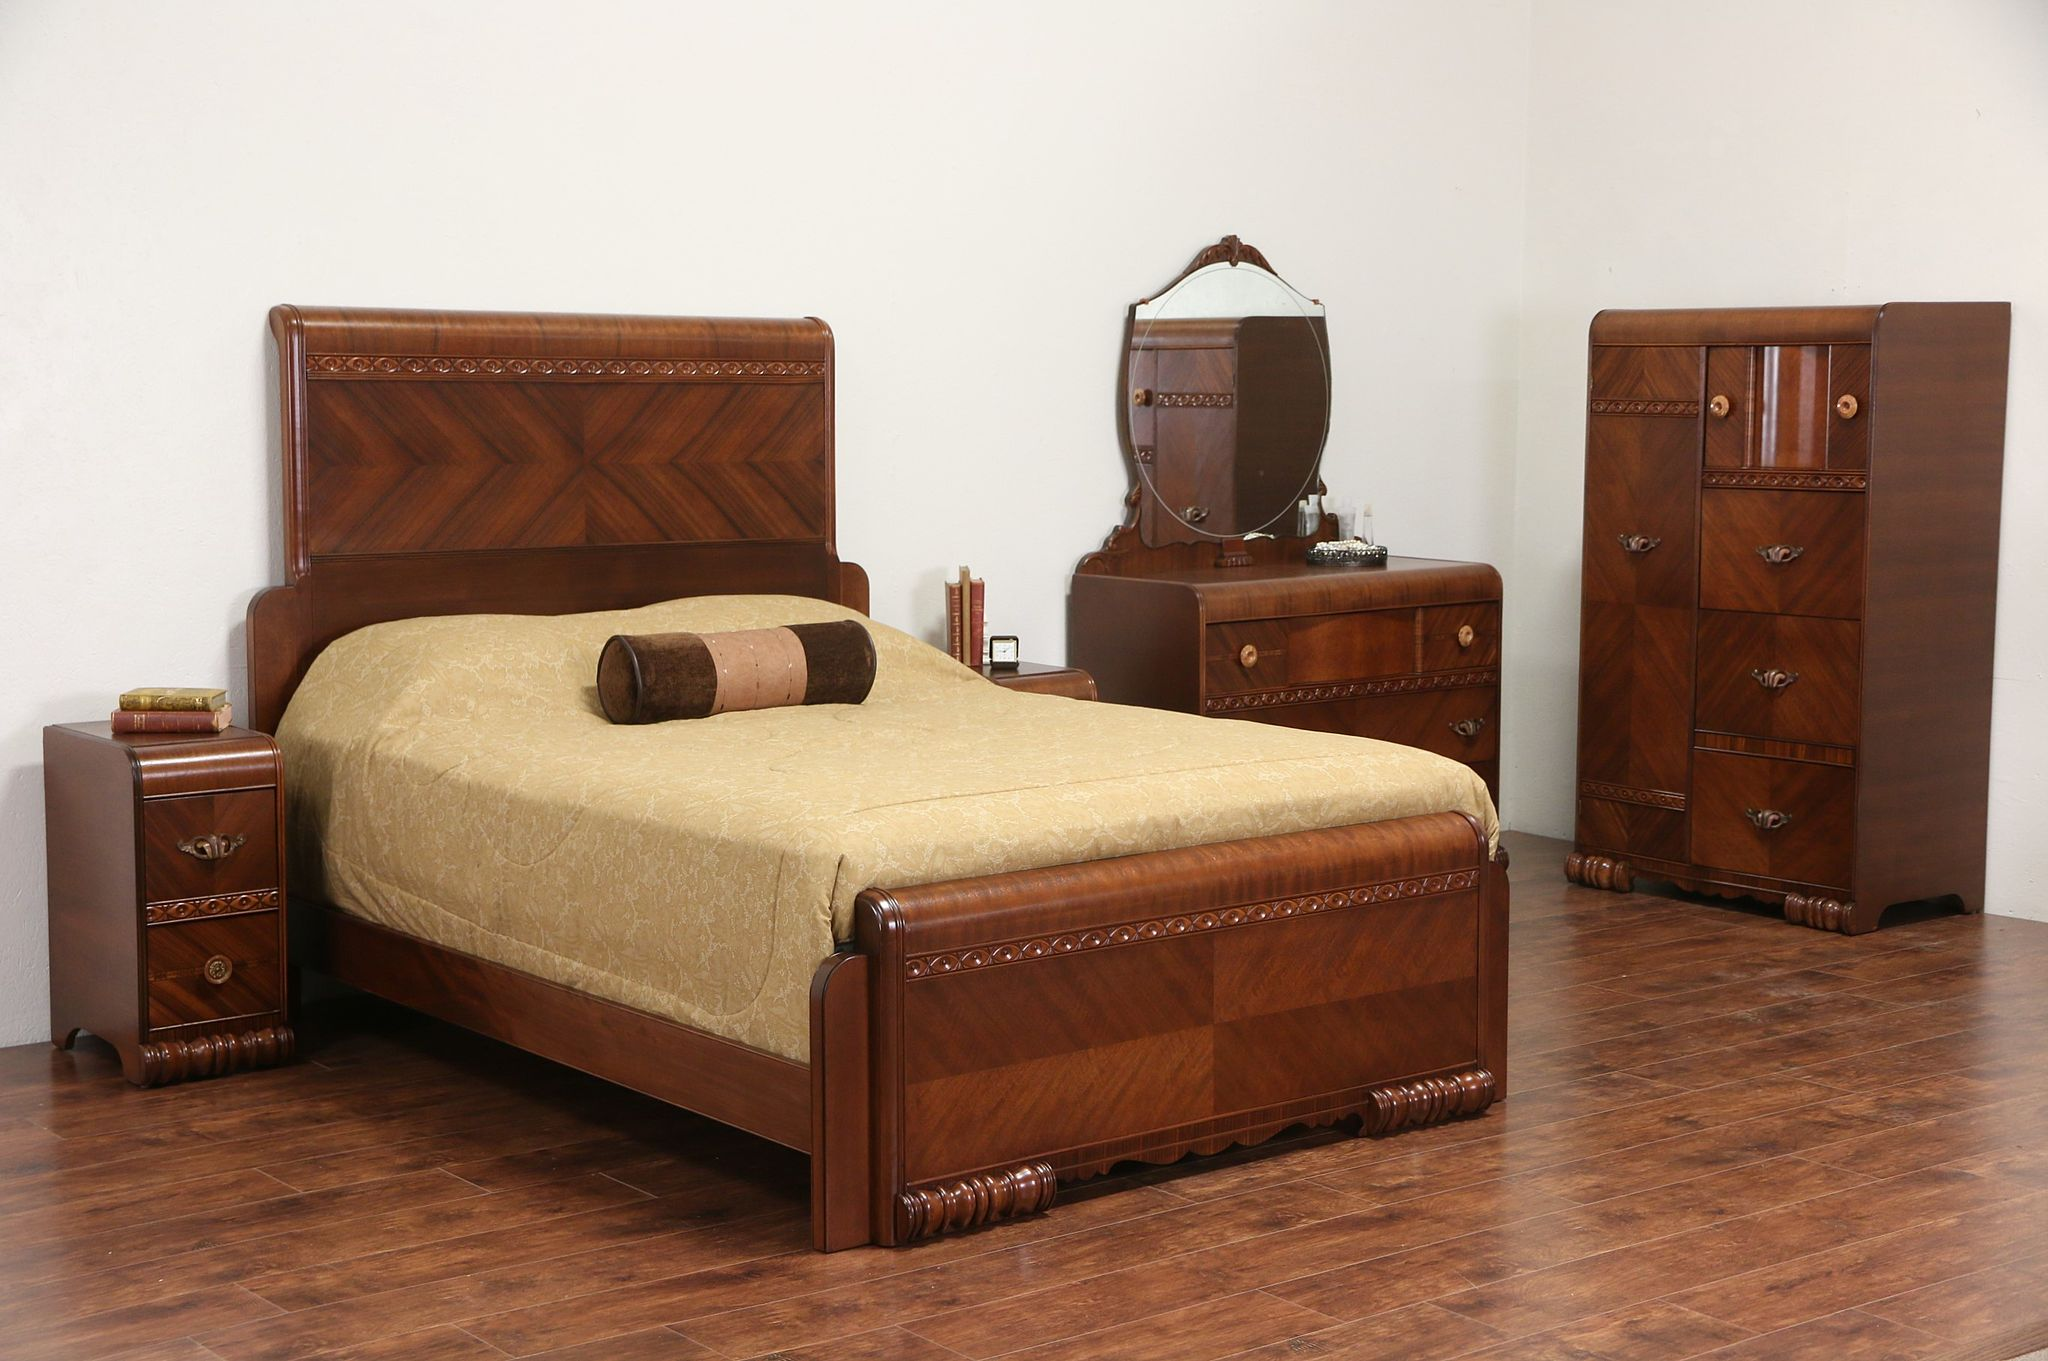 sold art deco 1935 vintage queen size waterfall 5 pc bedroom set with nightstands harp gallery. Black Bedroom Furniture Sets. Home Design Ideas